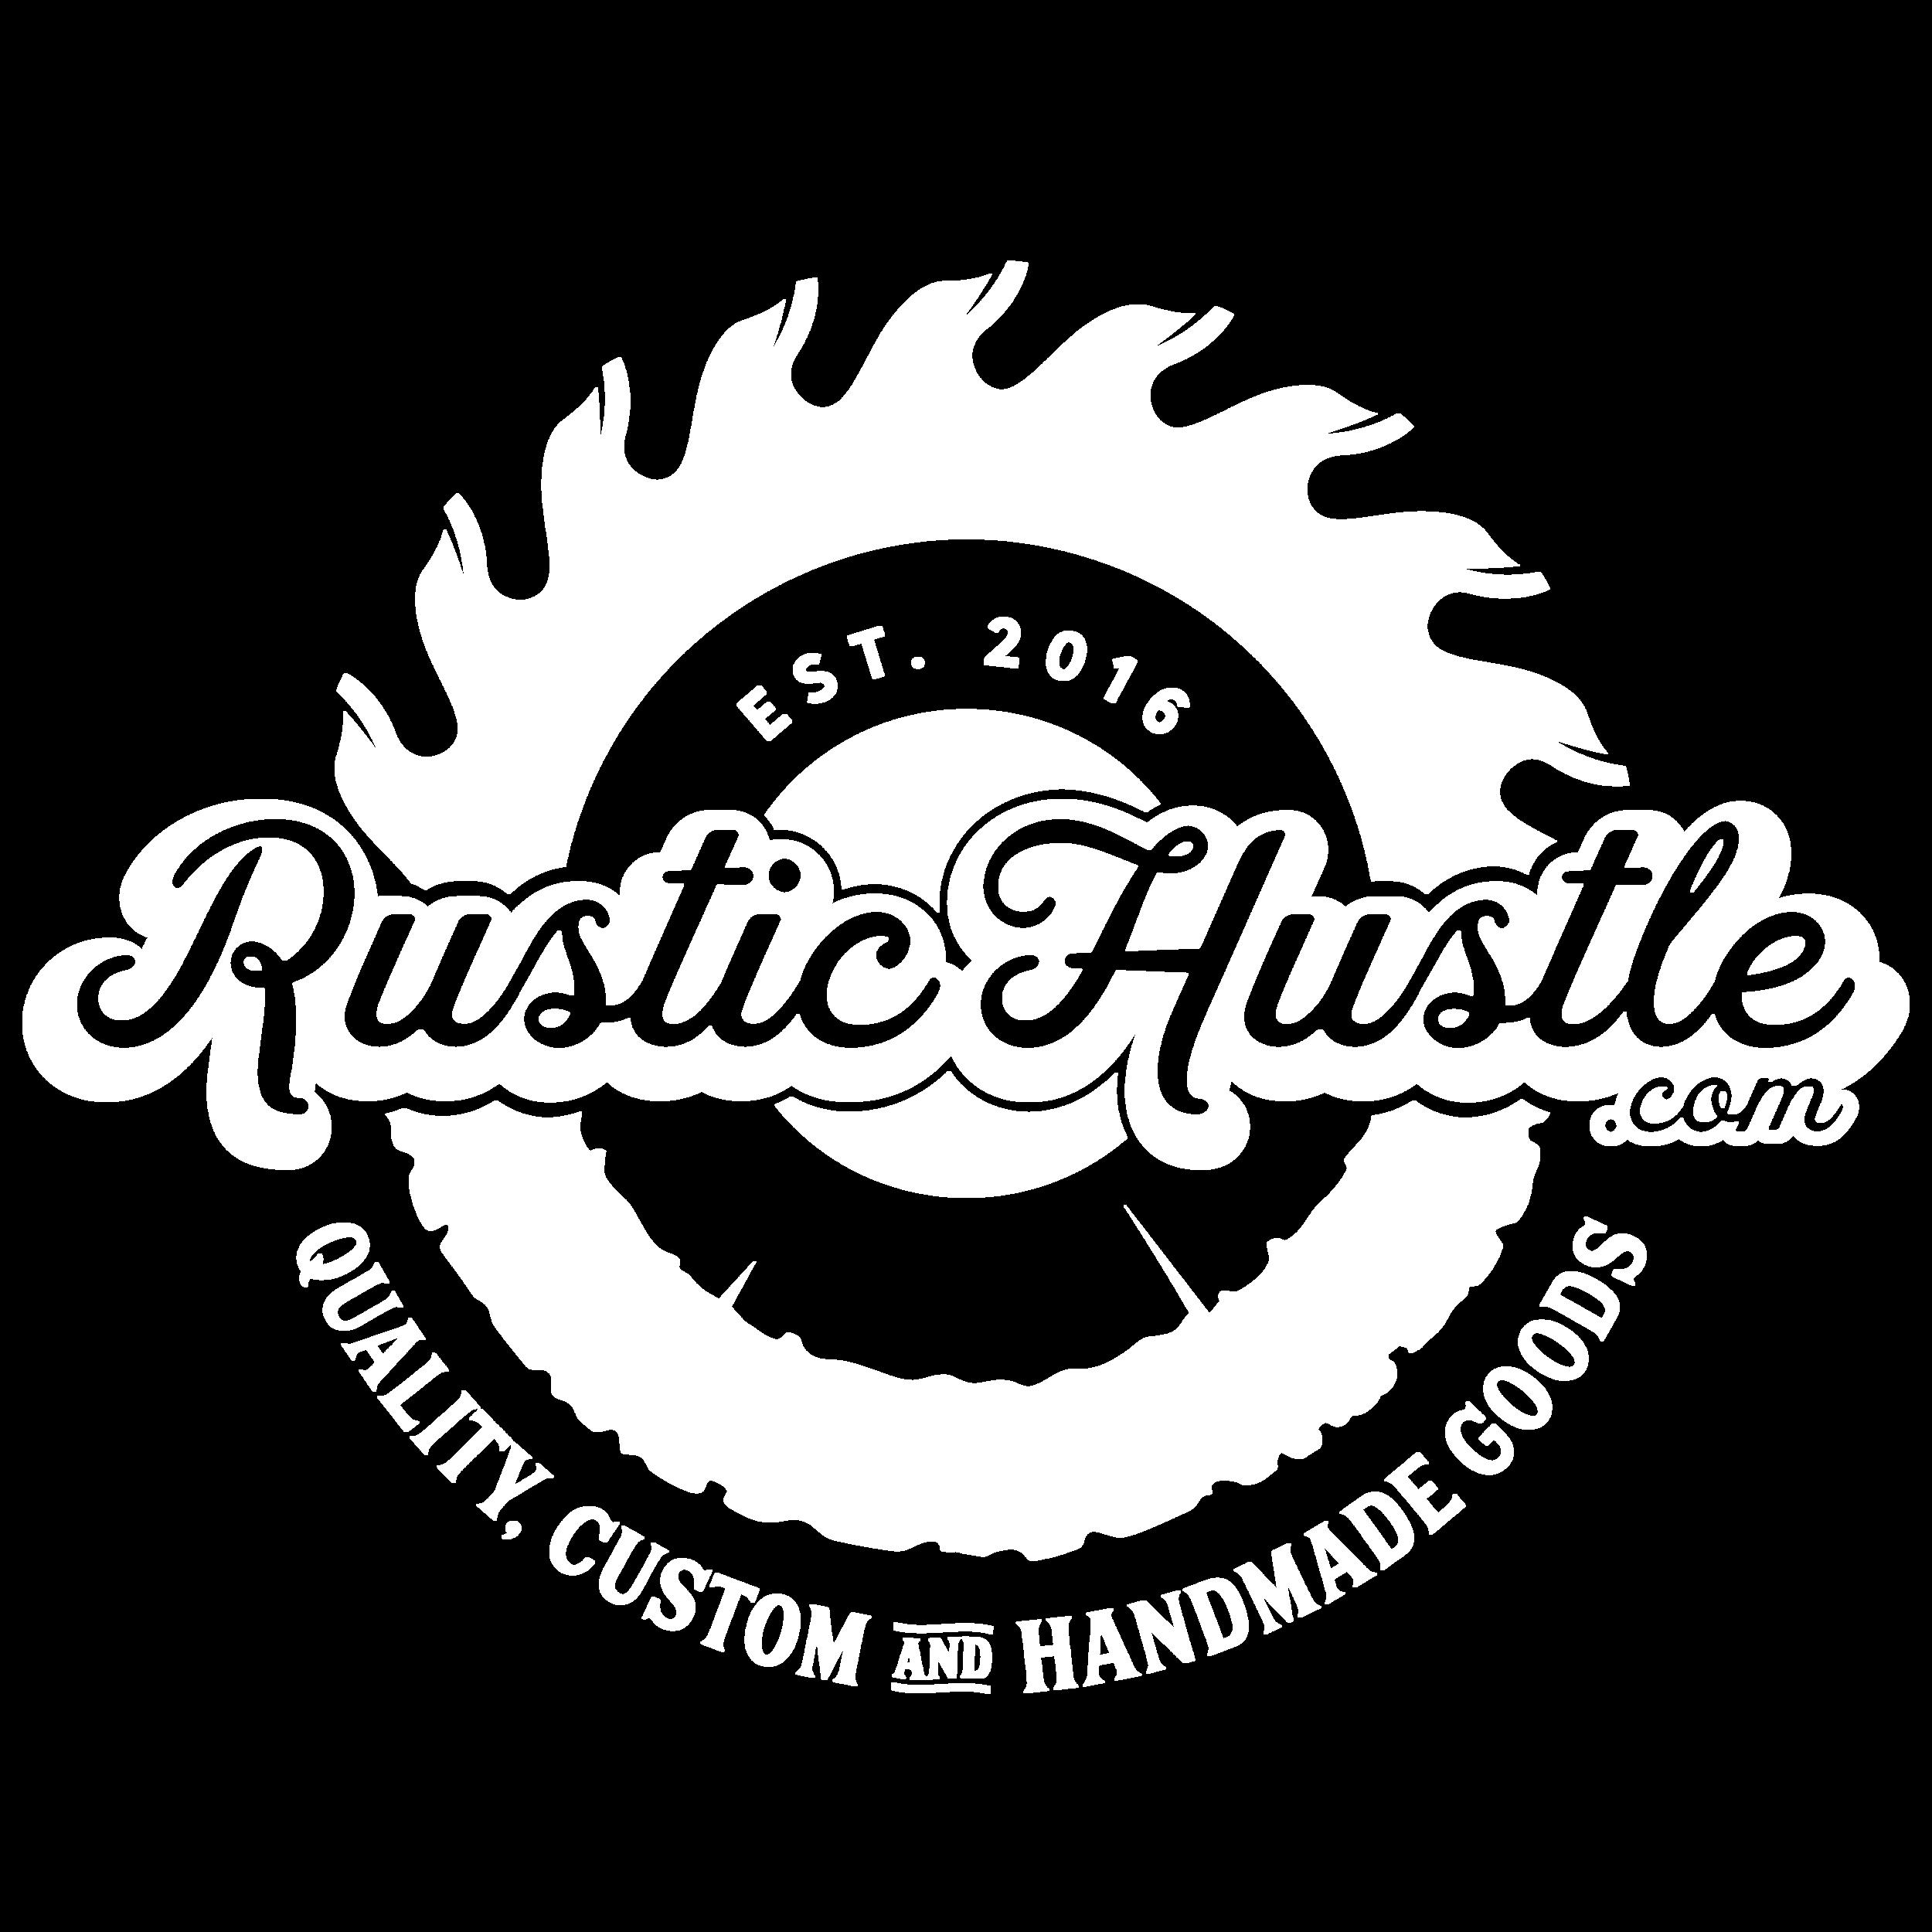 LogoJan2017Revision-White.png